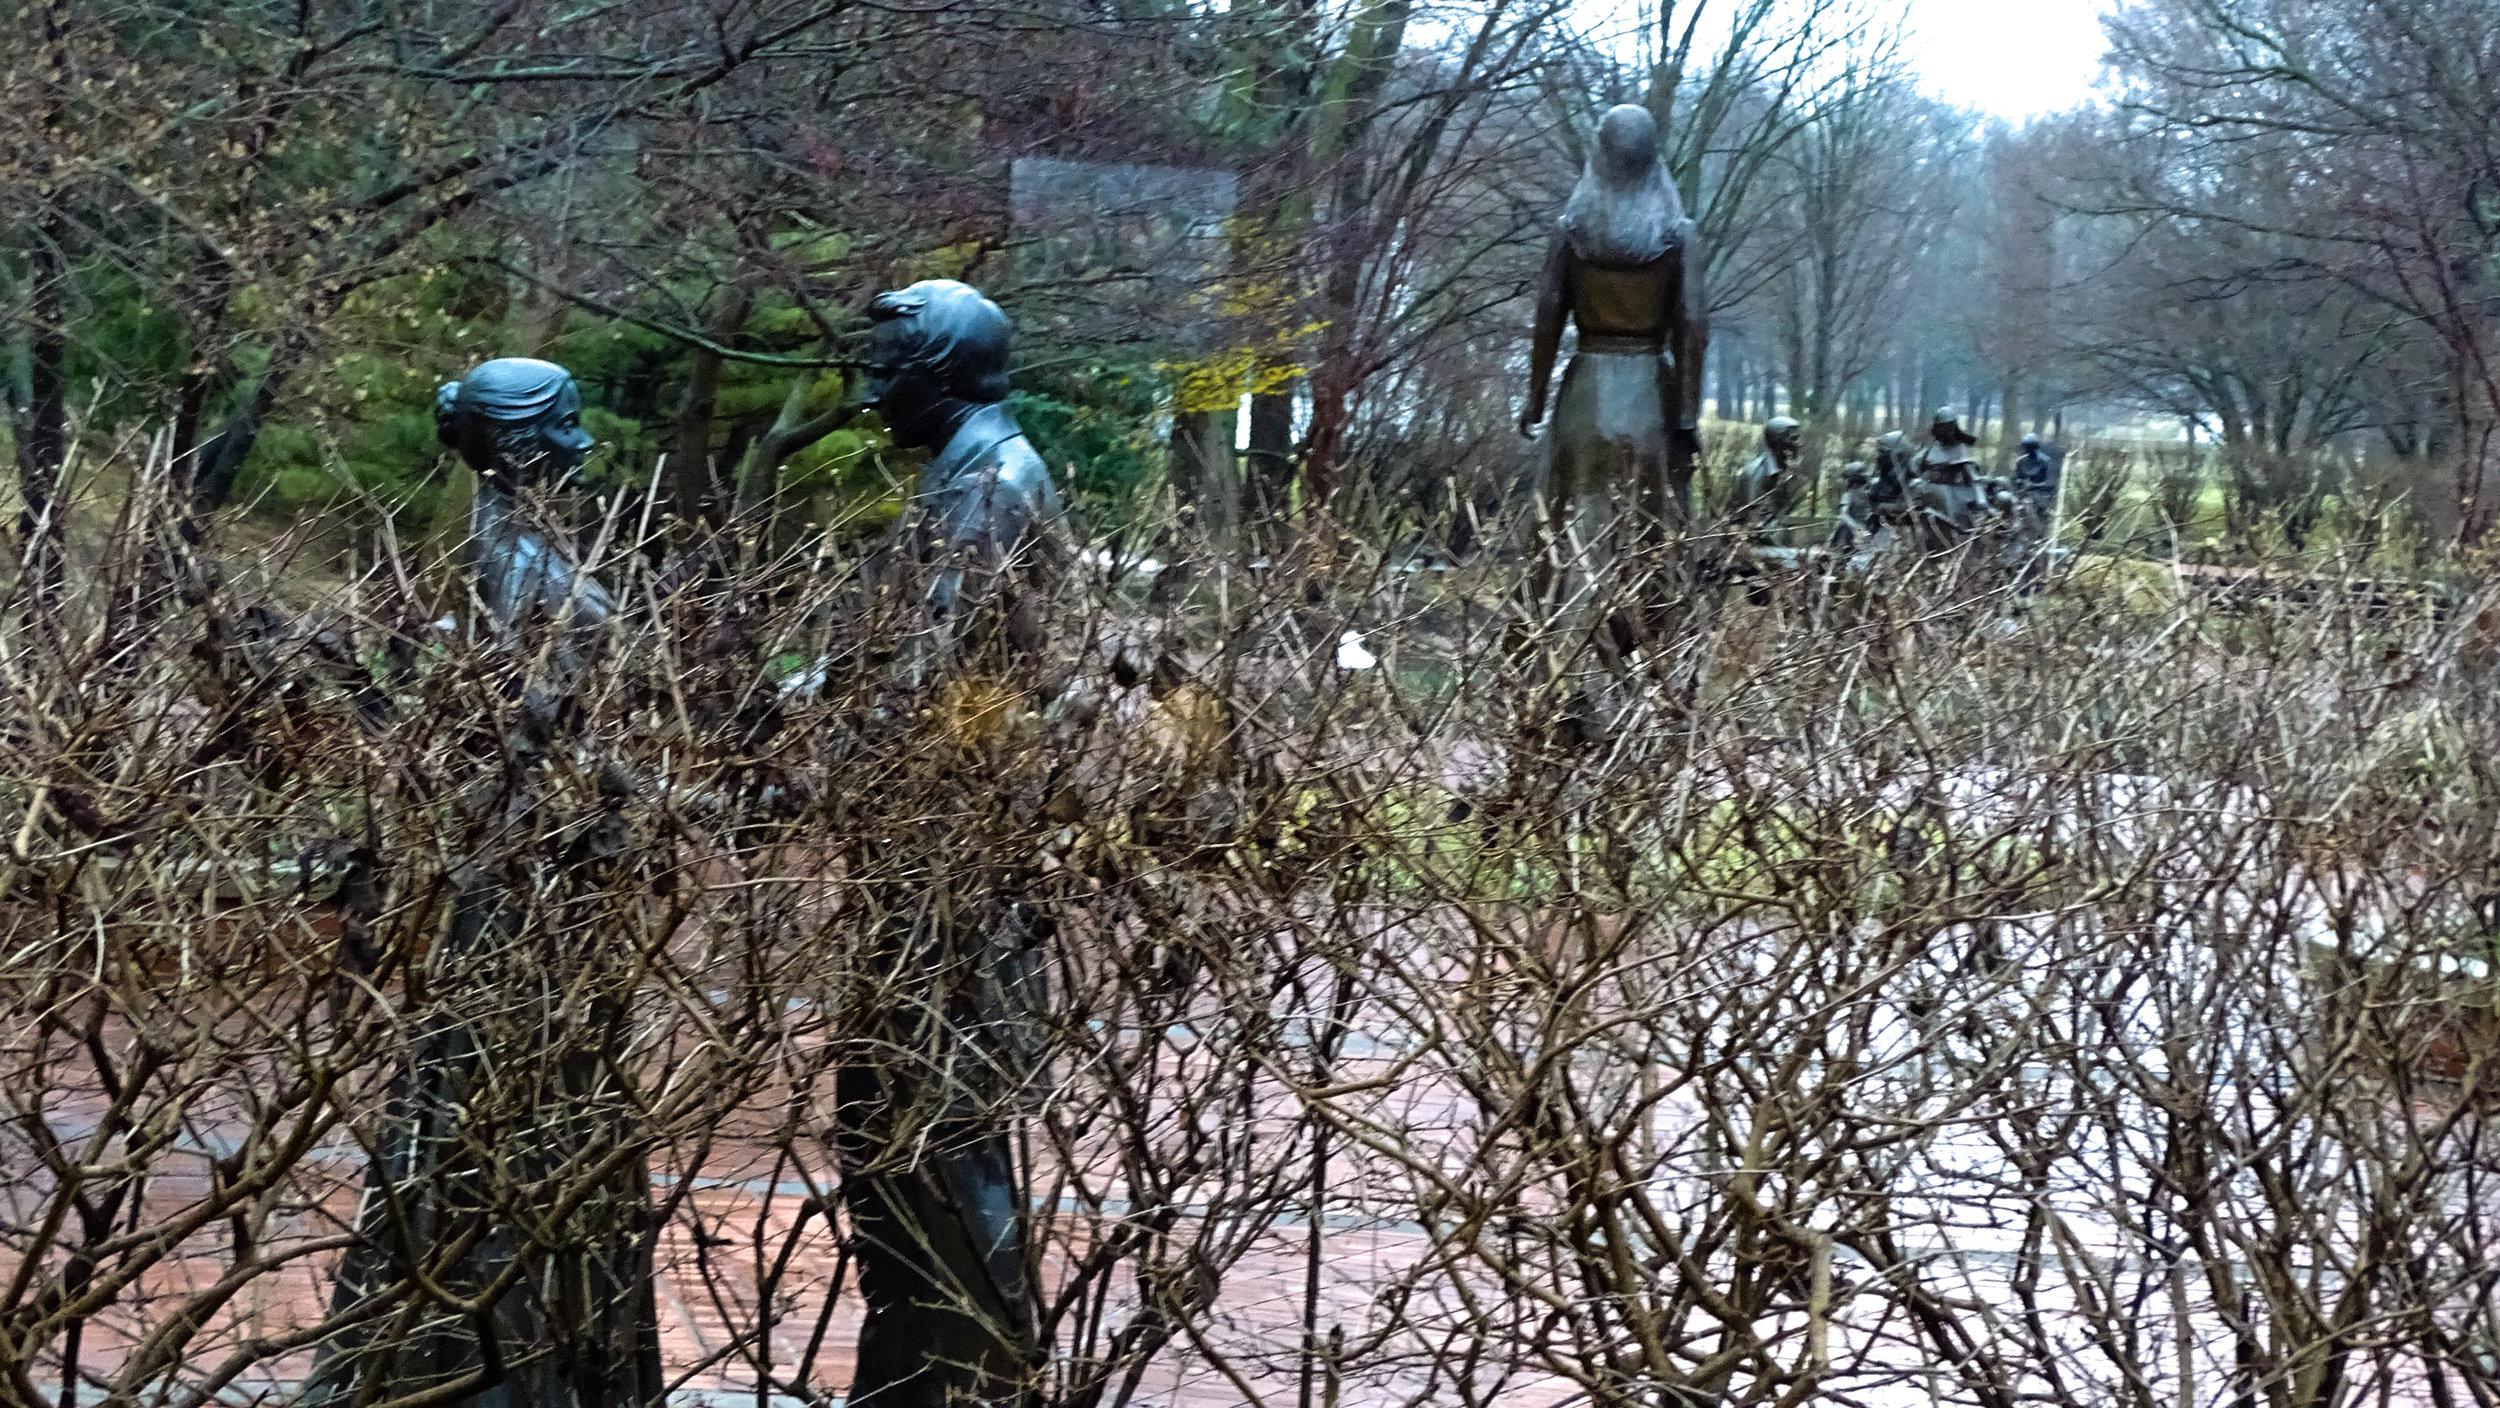 Monument to Women Memorial Garden Nauvoo, Illinois